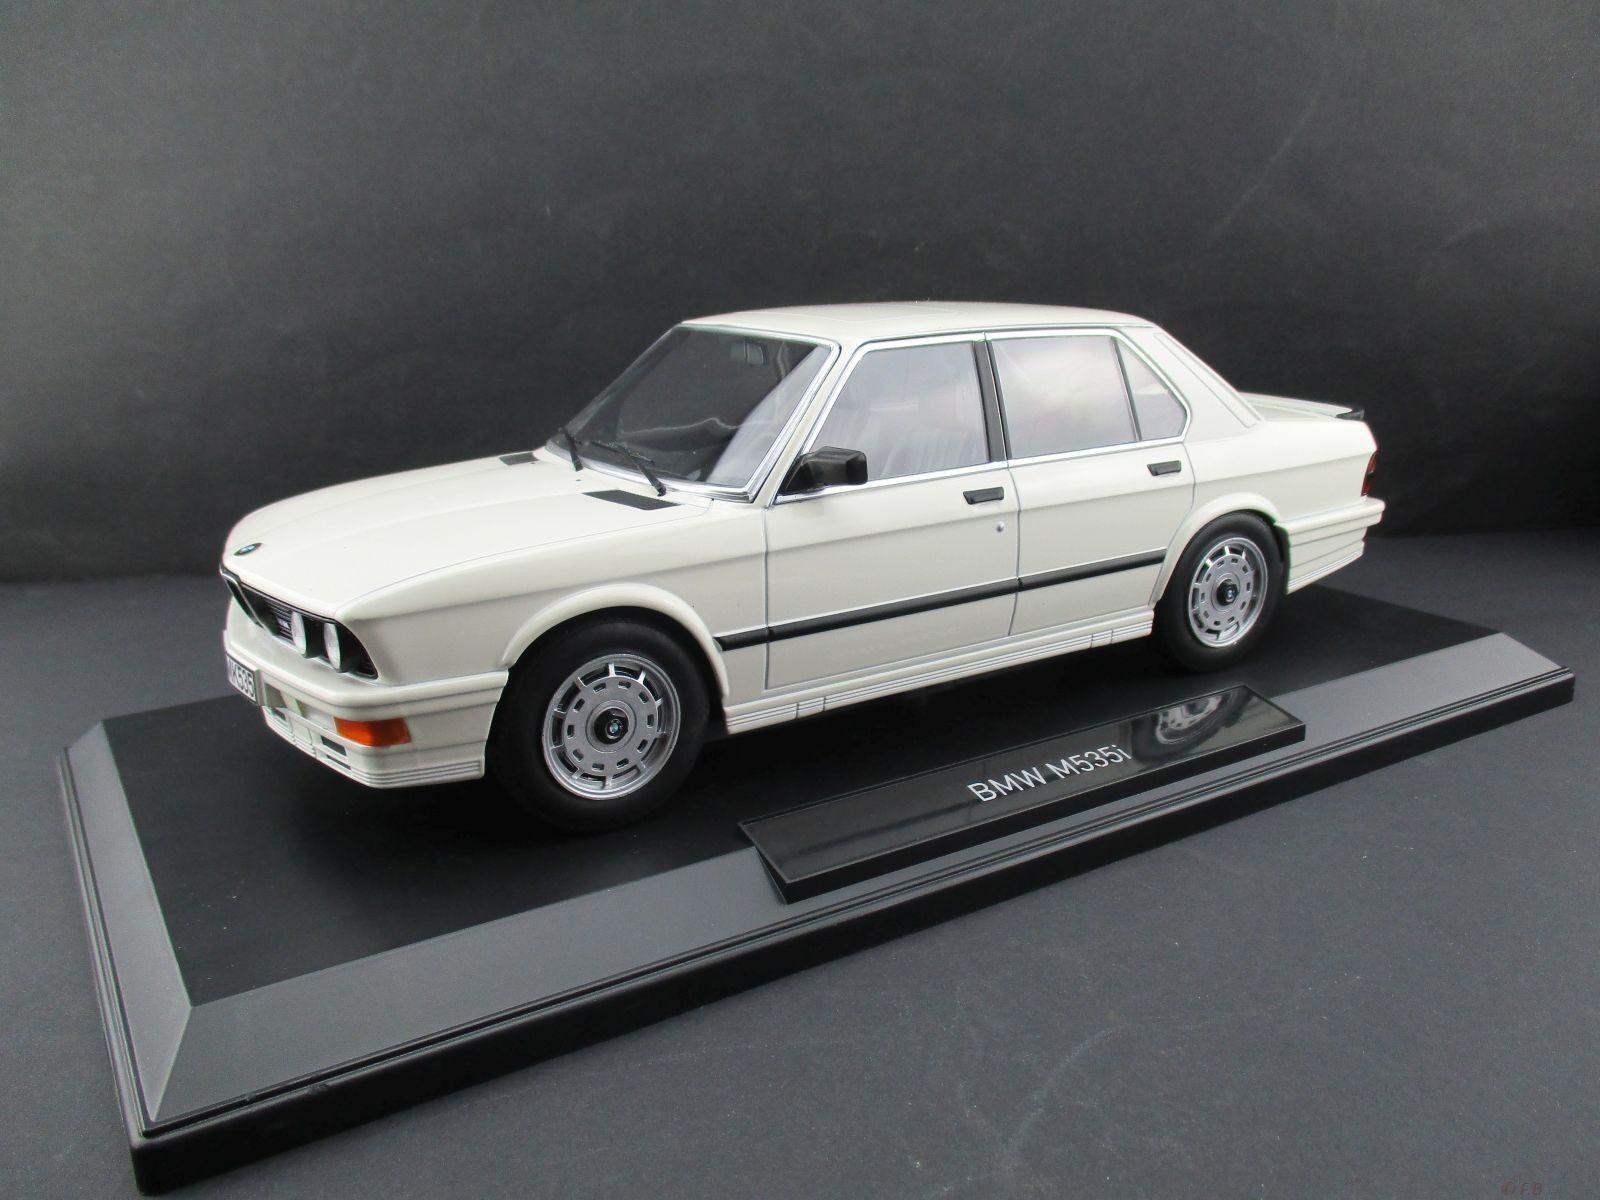 BMW M535 I  1986  Limitiert auf 1.000 Stück  Norev  Maßstab 1 18  OVP  NEU